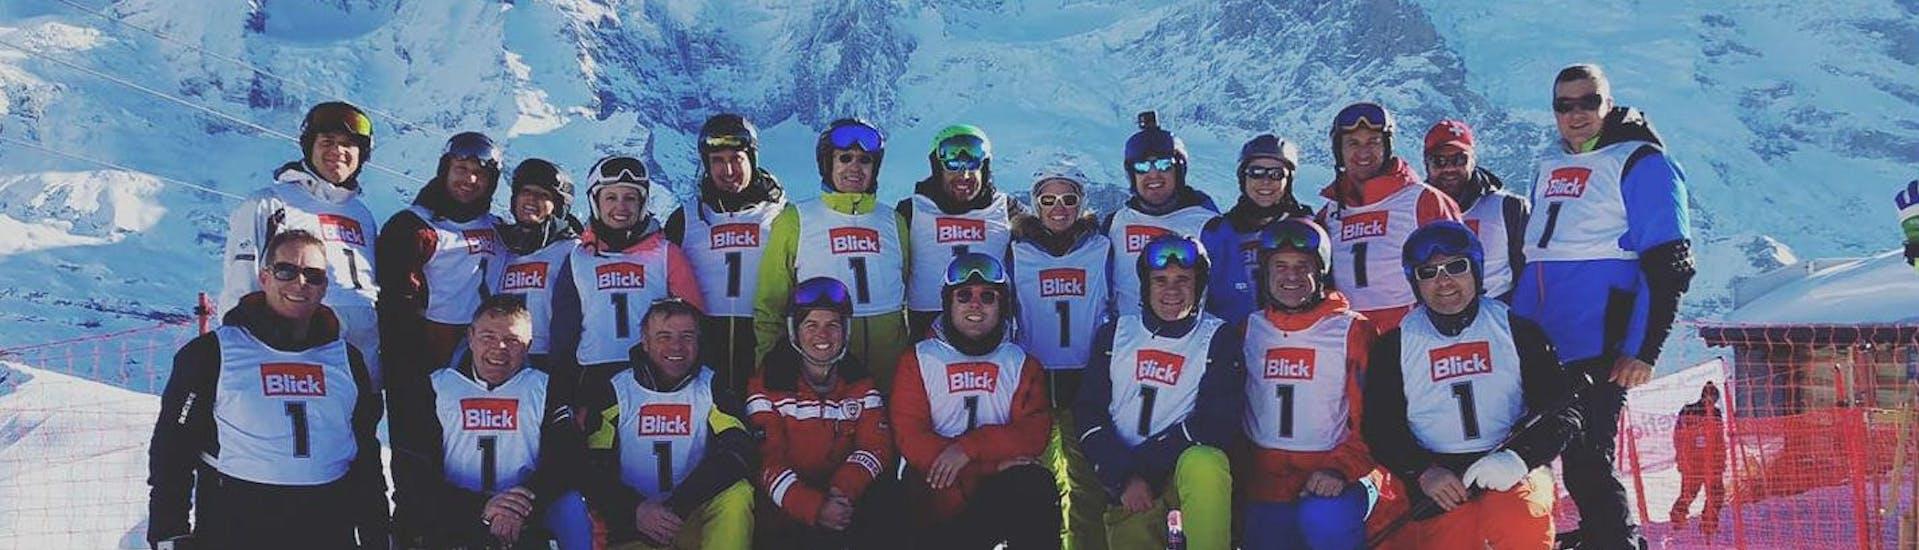 Adult Ski Lessons for Beginners met Schweizer Ski- und Snowboardschule Wengen - Hero image